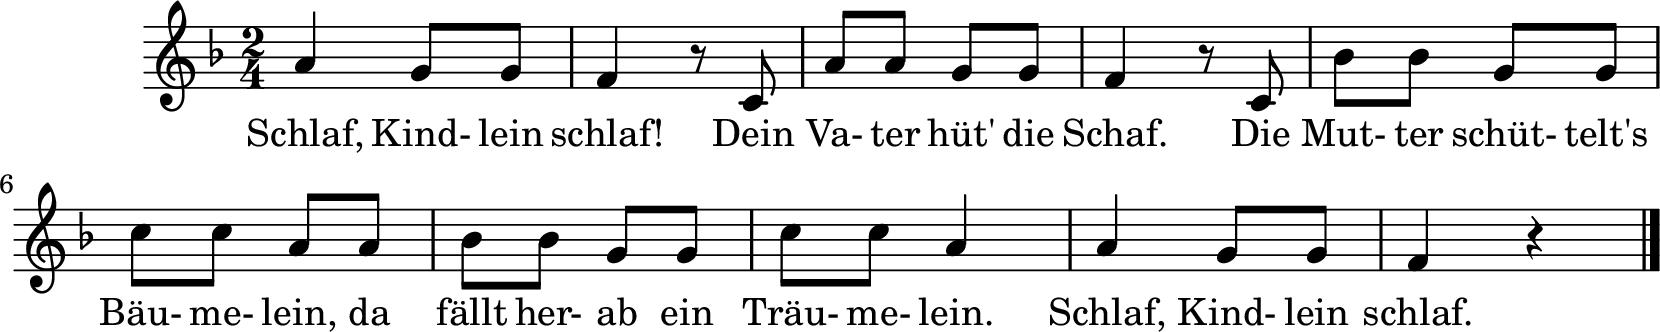 Notenblatt Music Sheet Schlafkindlein